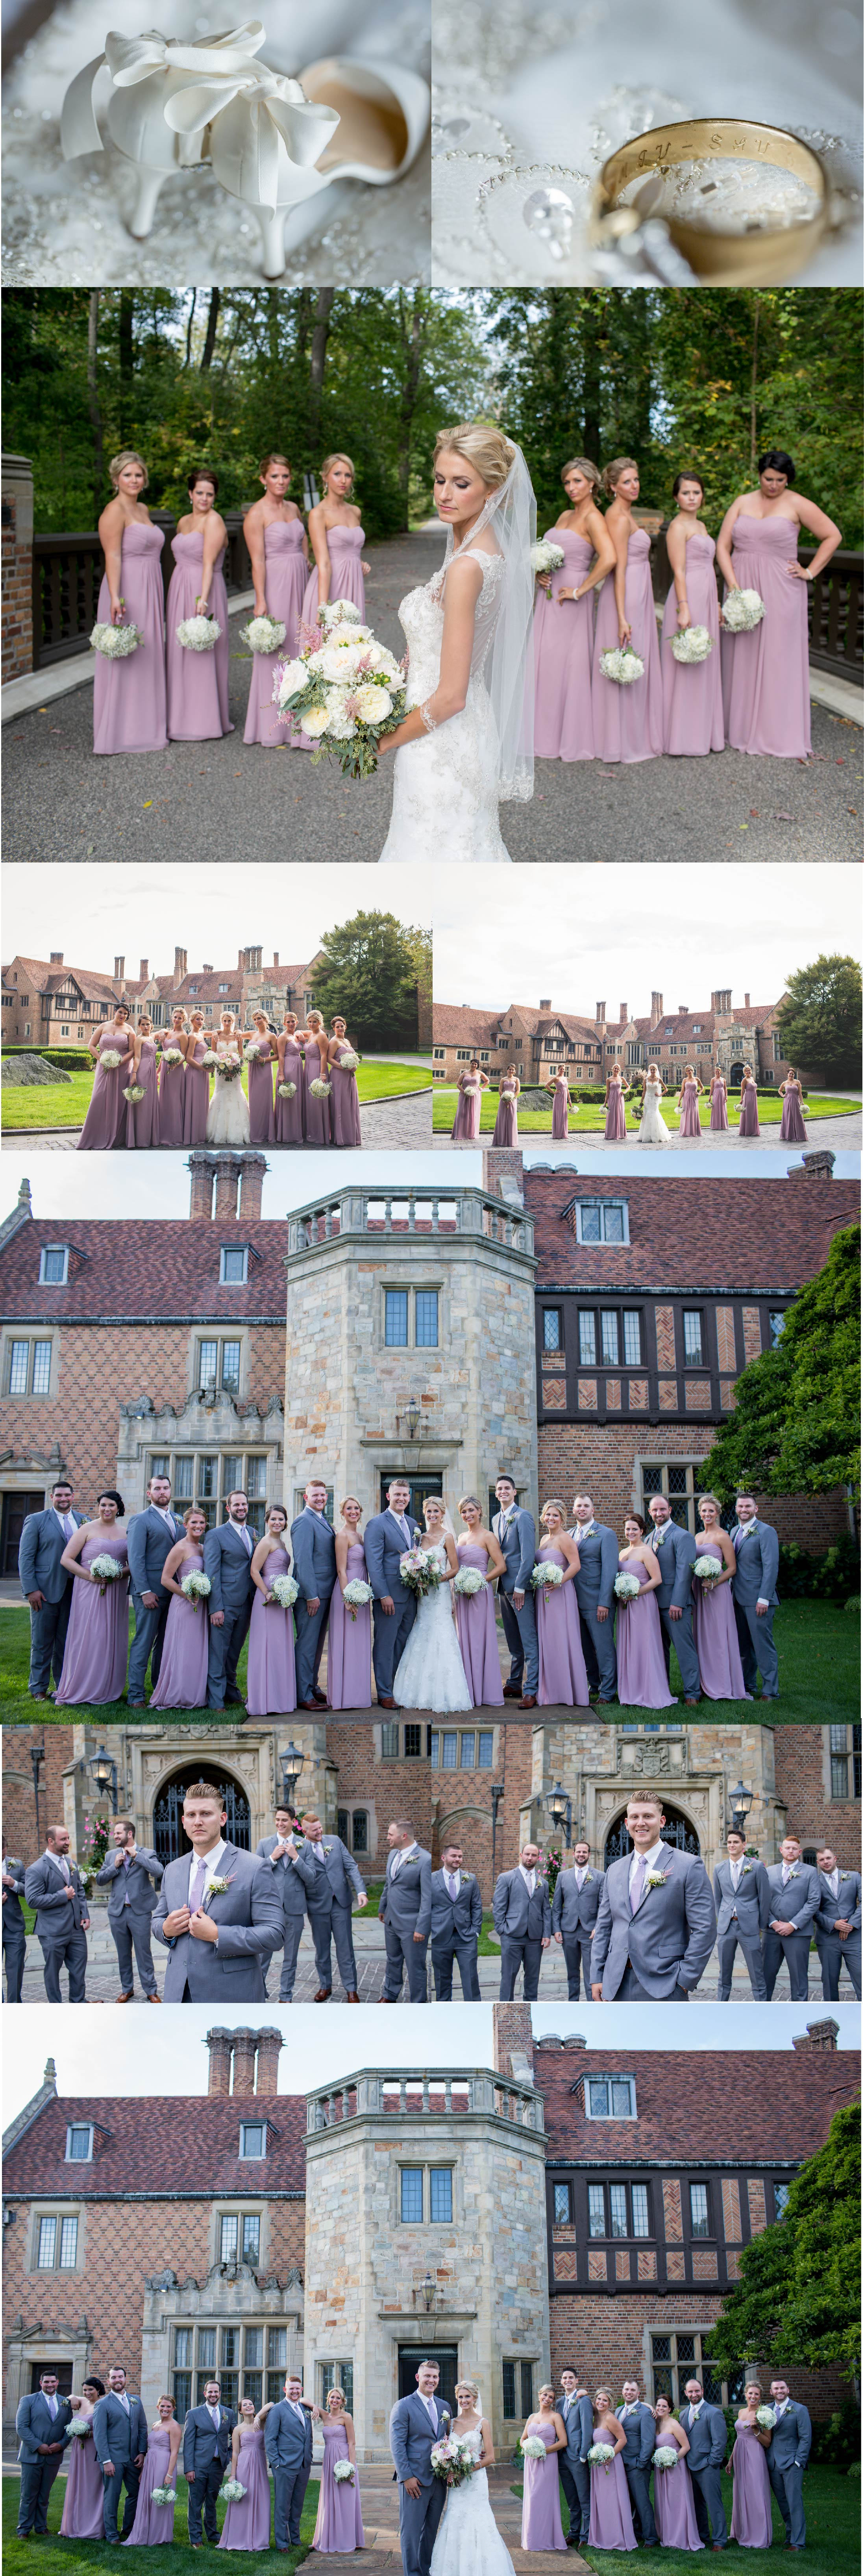 Royal Oak Wedding Photographers-Weddings by Adrienne & Amber #meadowbrook #meadowbrookhall #detroit #michigan #photography #weddings #rochester #outdoor #bride #groom #beautiful #viel #couple #kiss #wedding #royaloak #photo